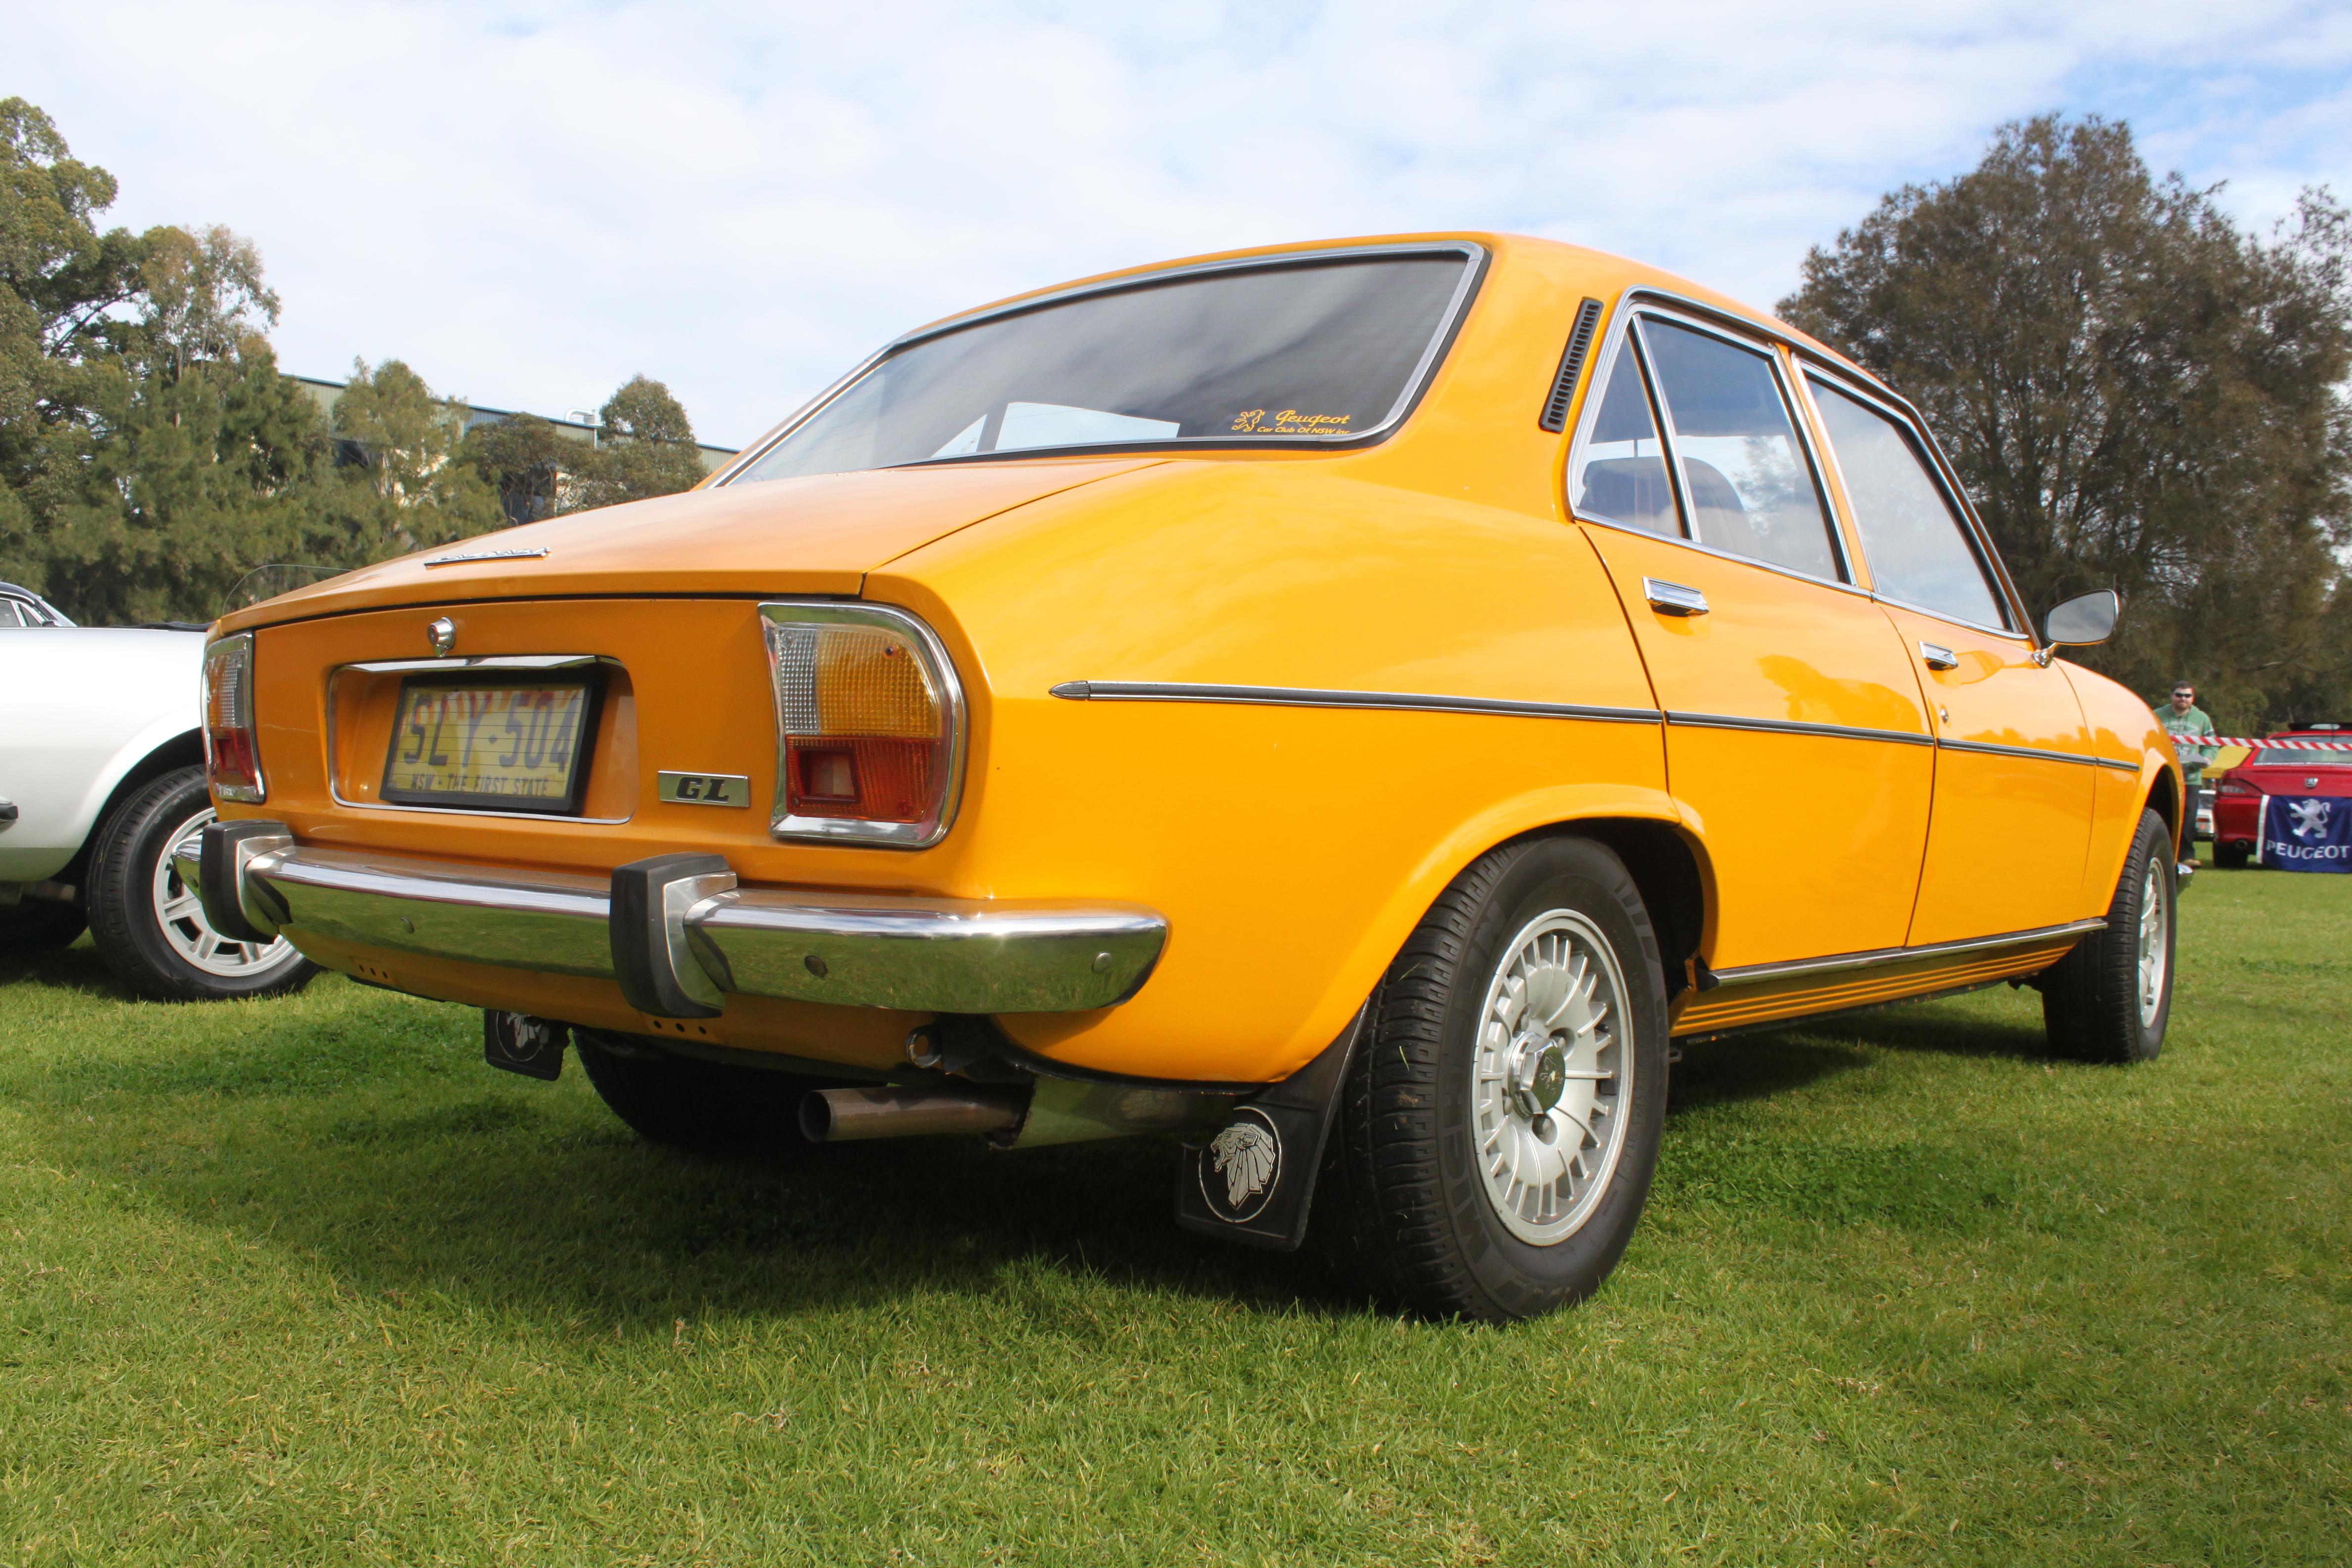 file:1975 peugeot 504 gl sedan (19583316199) - wikimedia commons